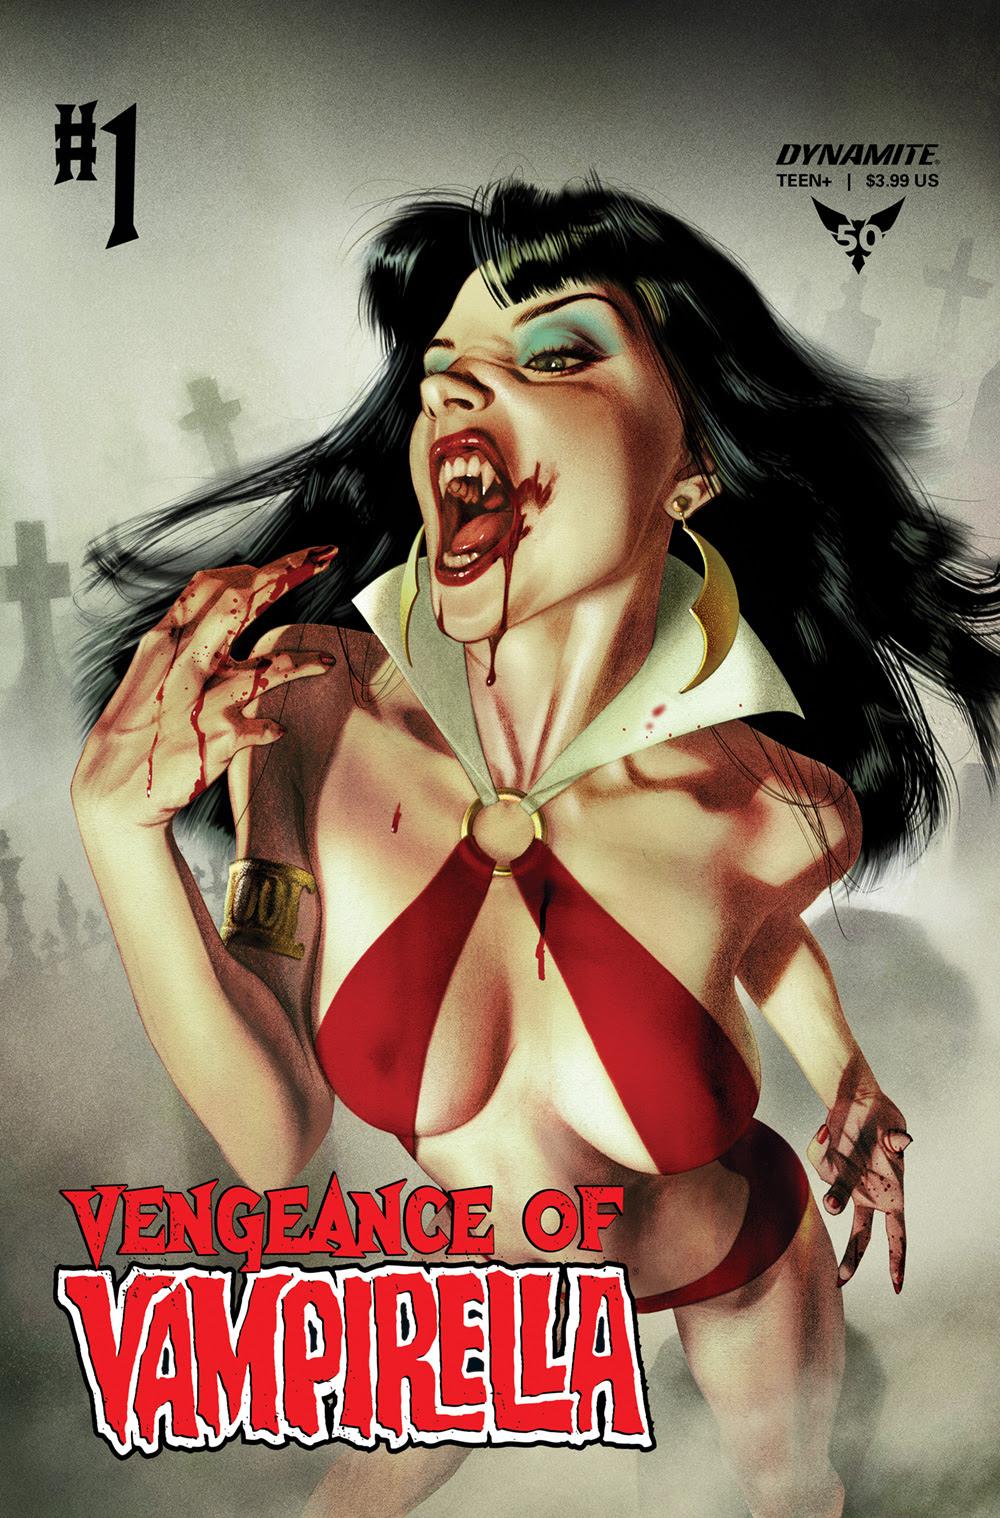 Tom Sniegoski Revives Vengeance of Vampirella at Dynamite For More Nineties Nostalgia